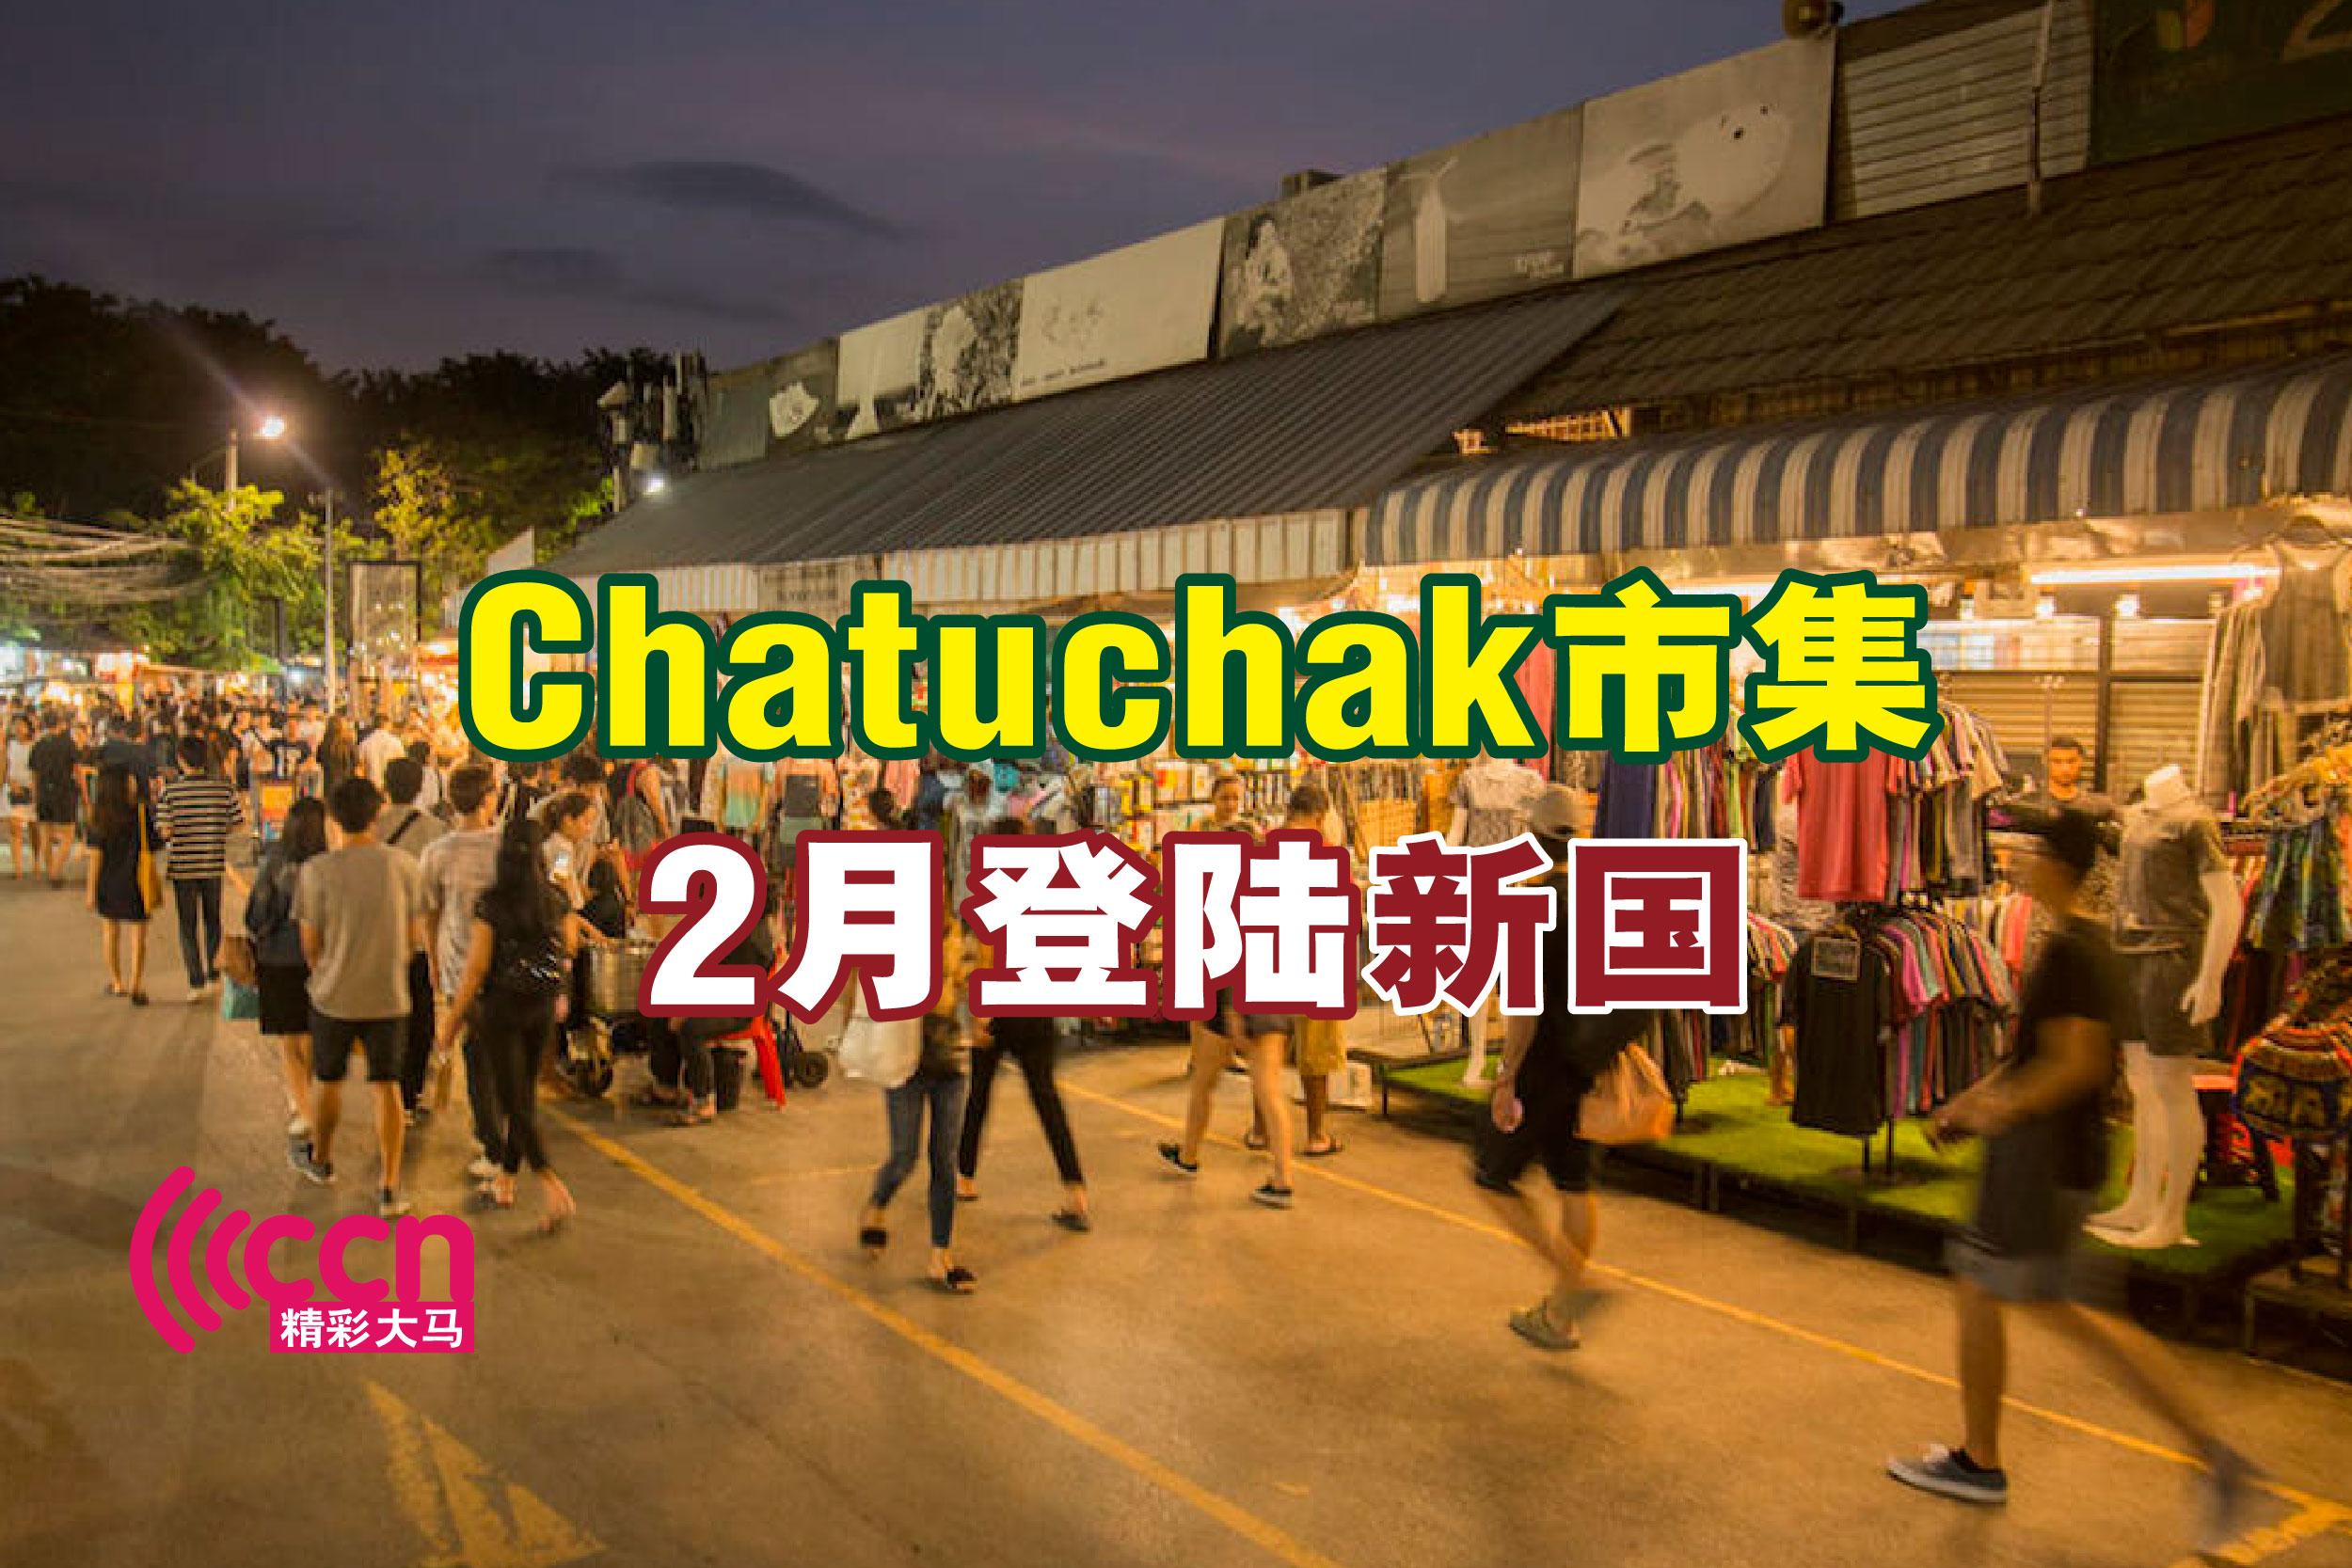 Chatuchak将会在明年2月登陆新加坡啦!